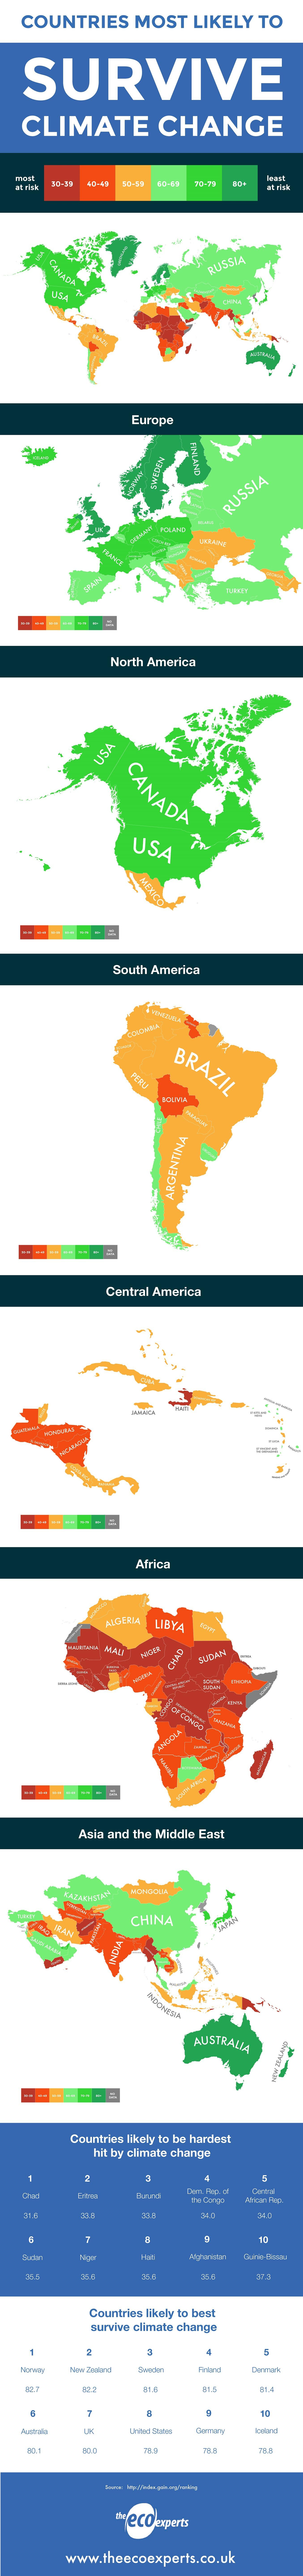 mudanca climatica mapa